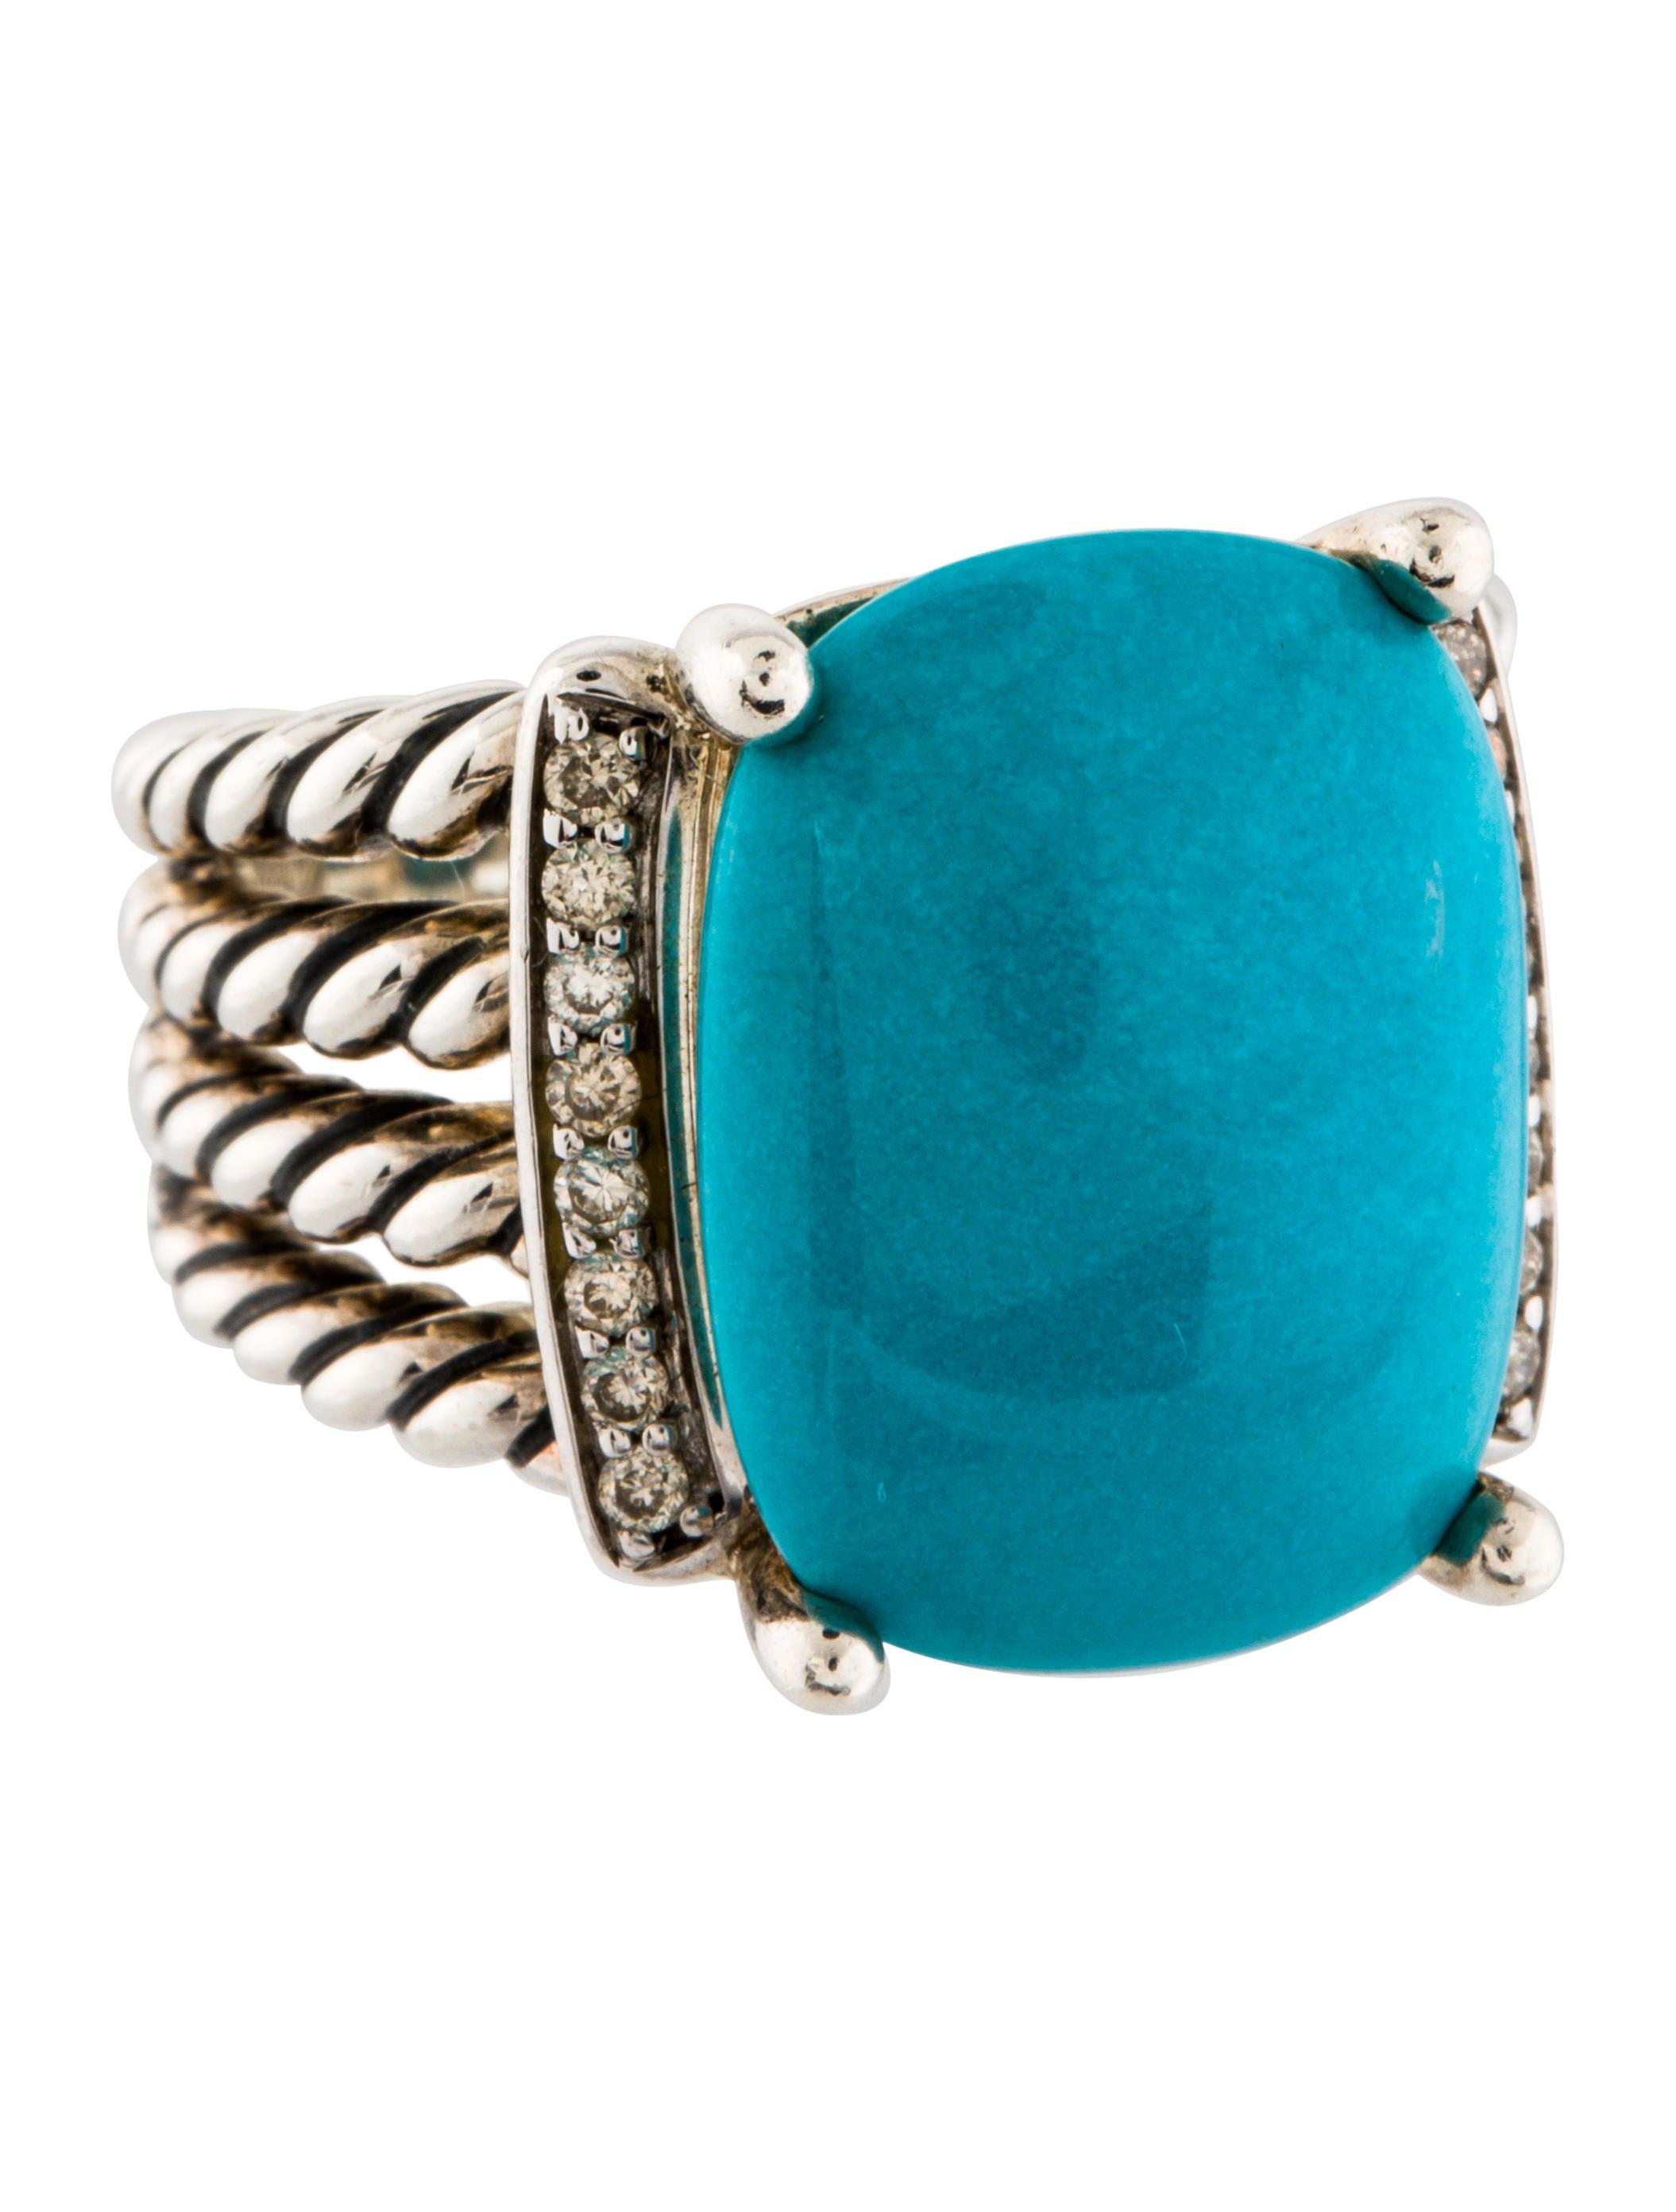 David yurman turquoise wheaton ring rings dvy37809 for David yurman inspired jewelry rings